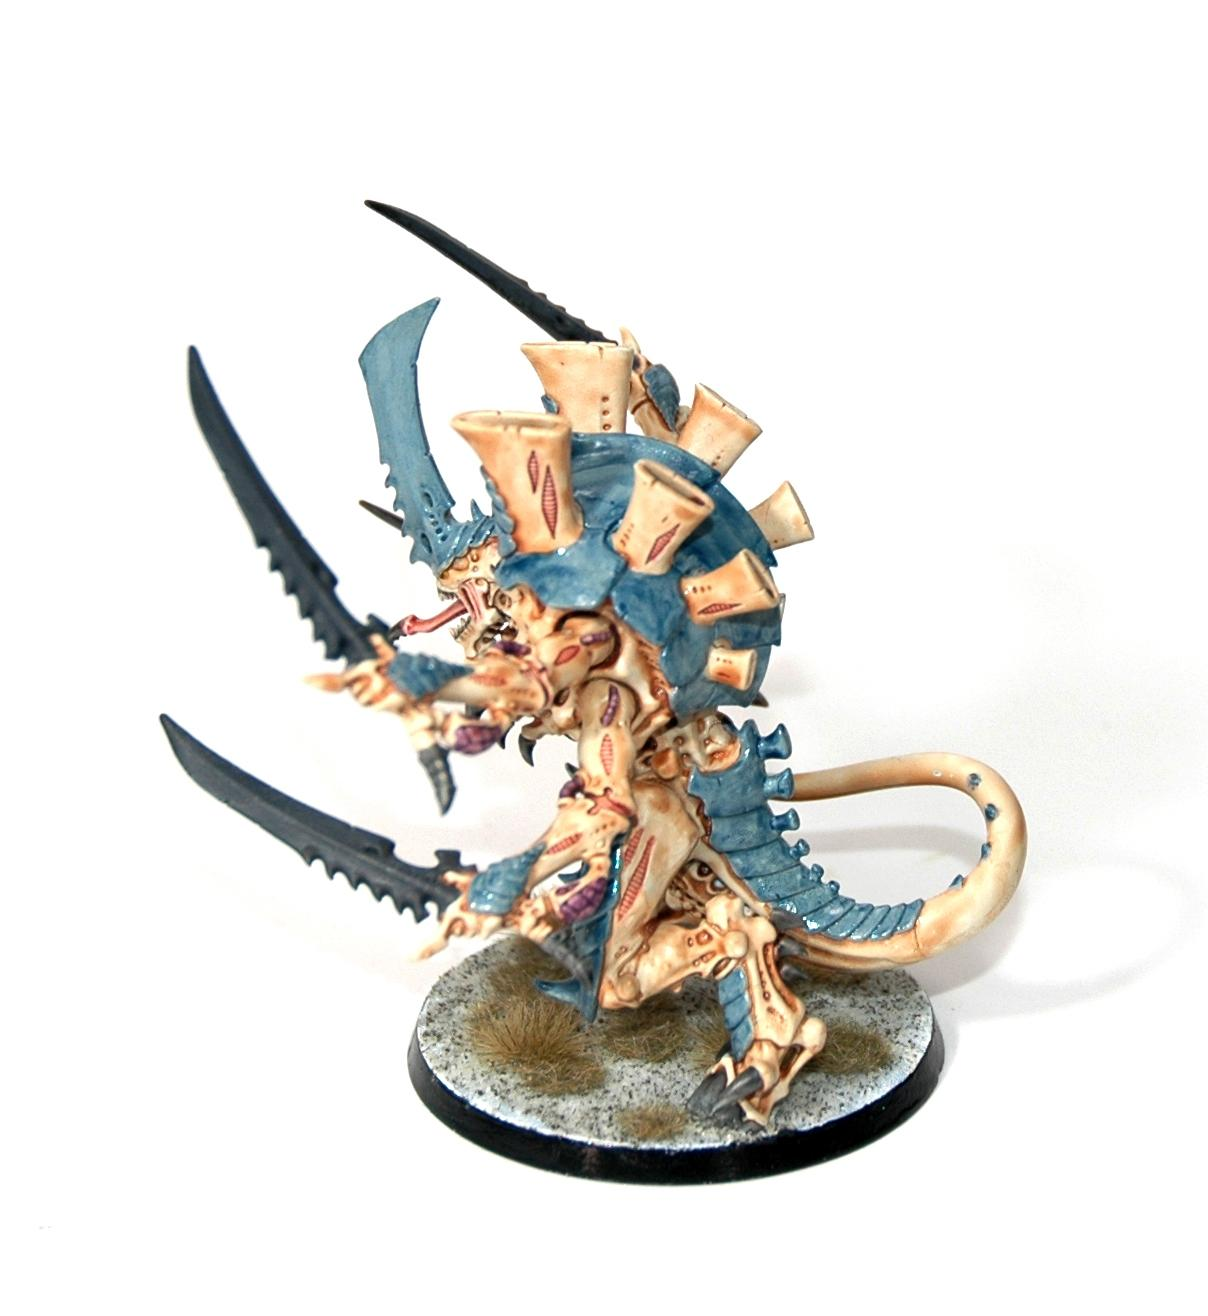 Swarmlord, Tyranids, Swarmlord